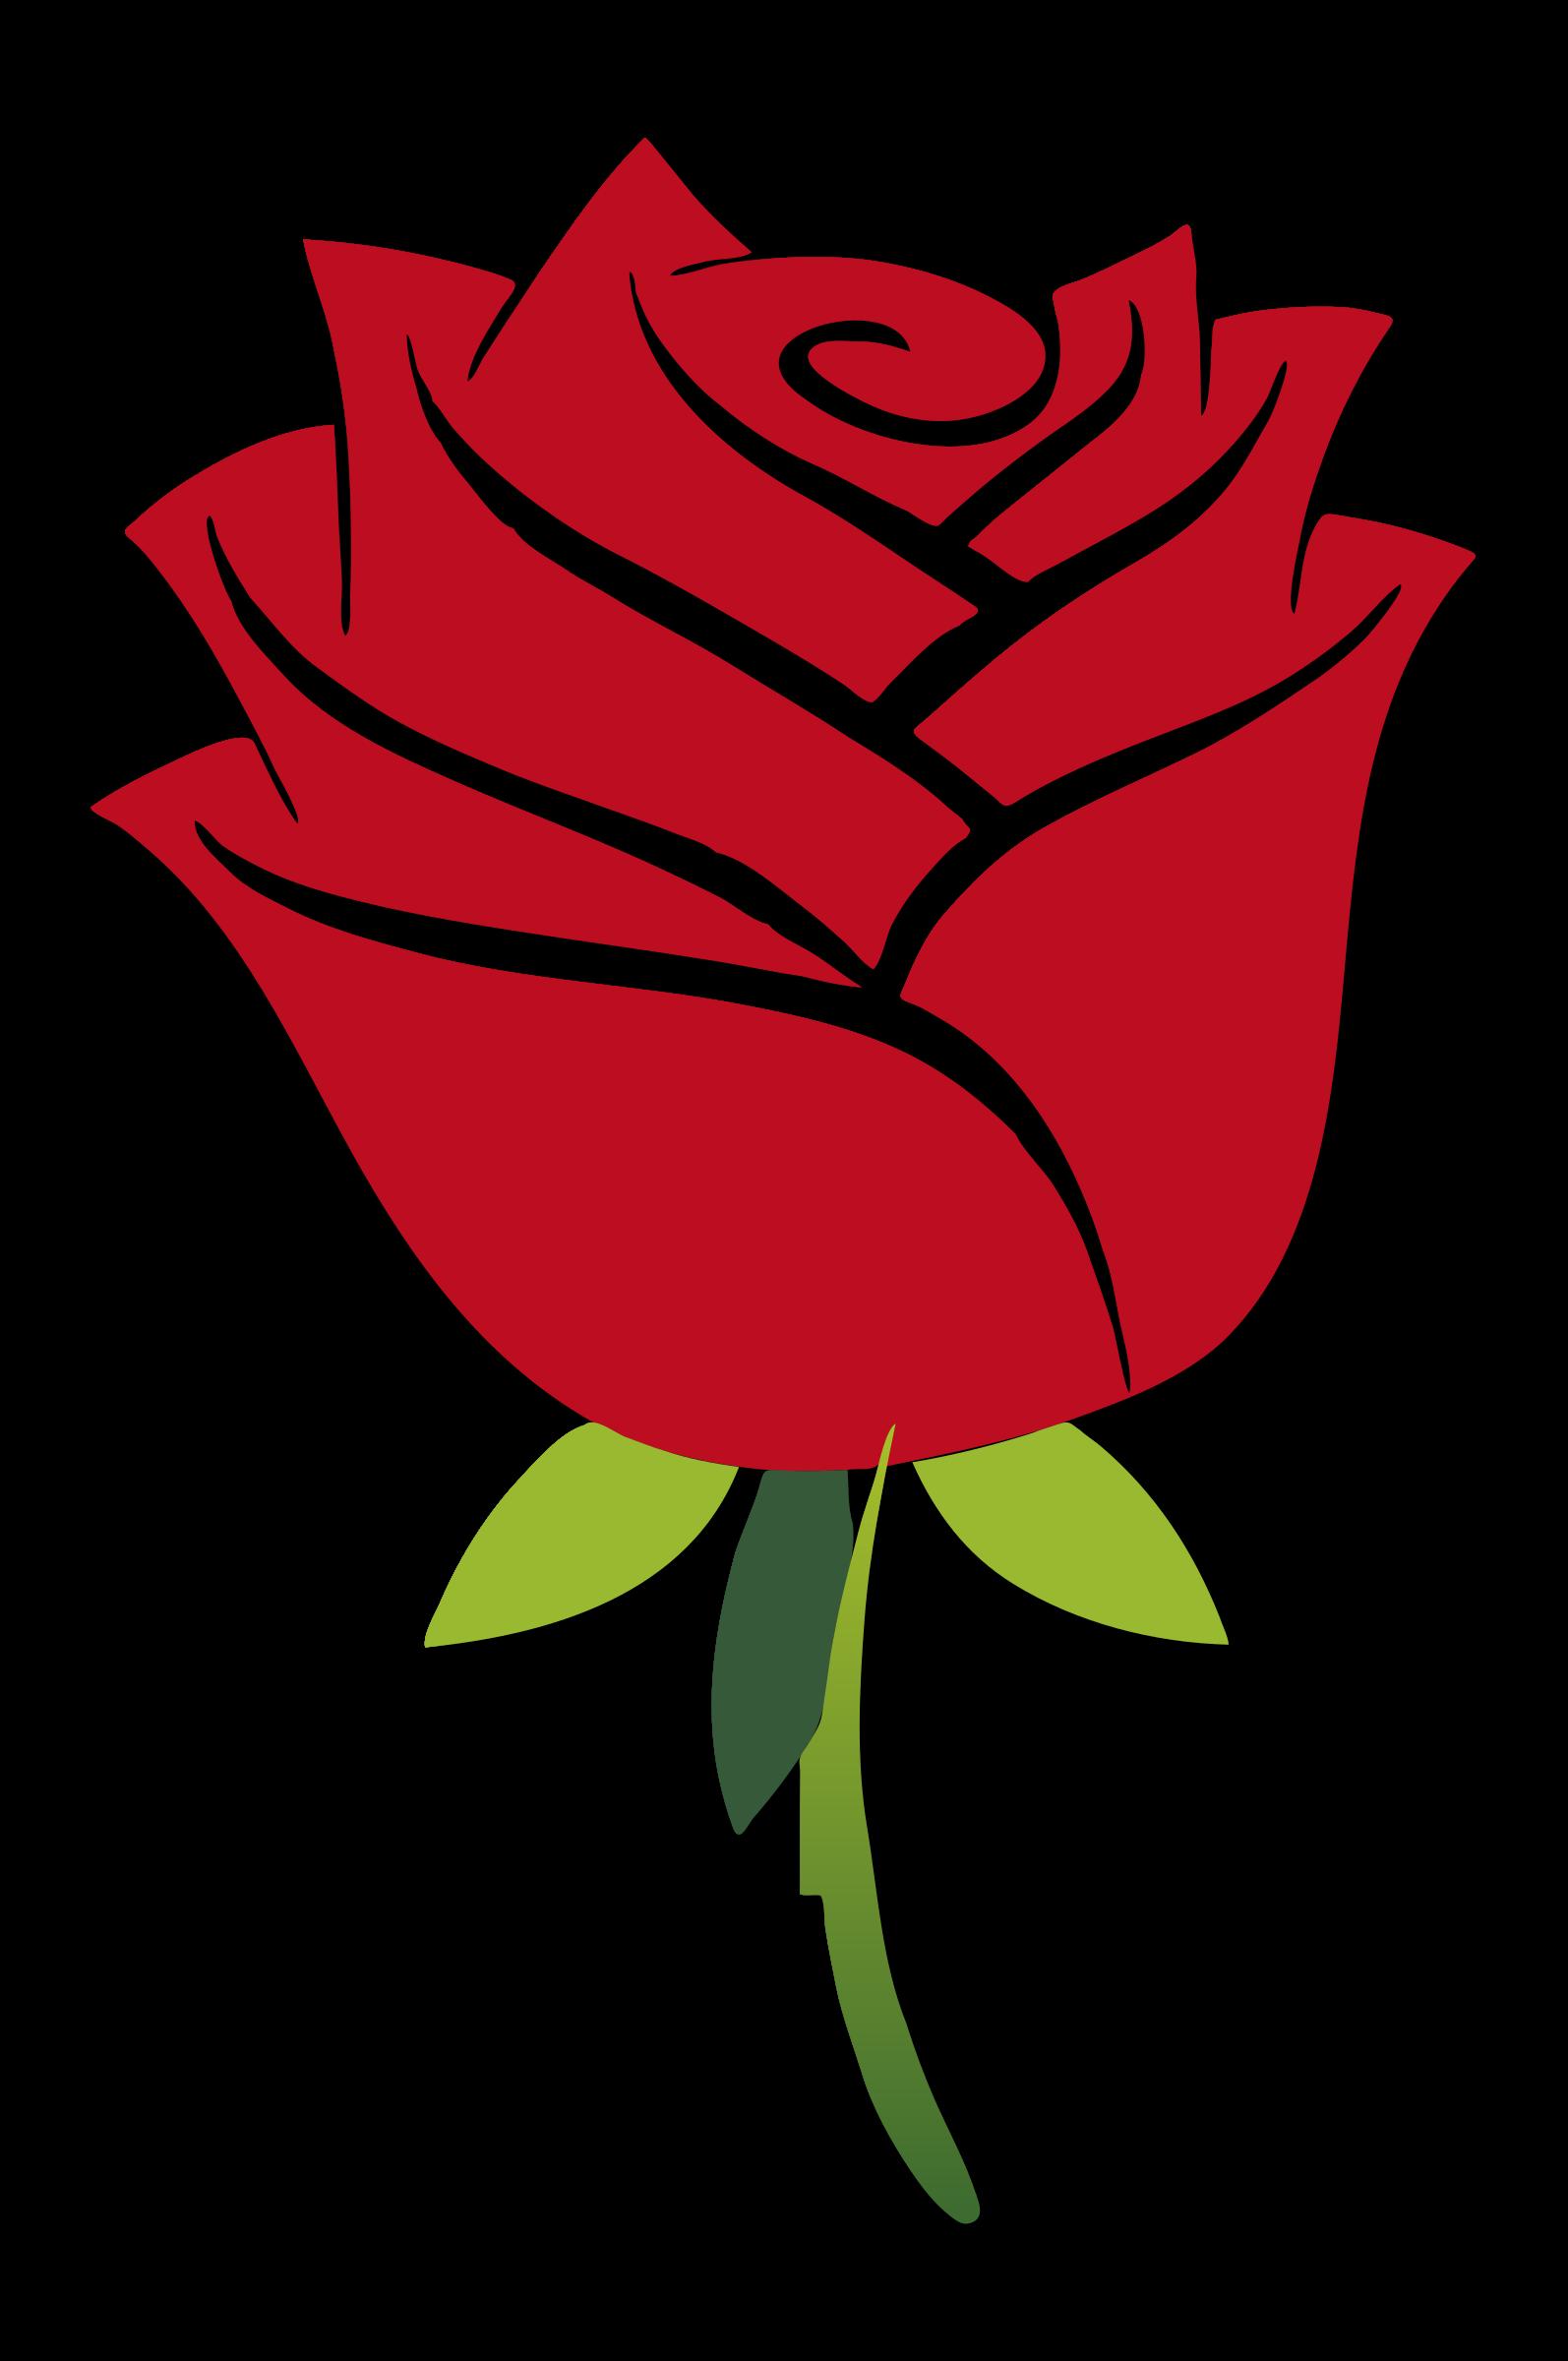 Clipart rose logo. Stylized big image png